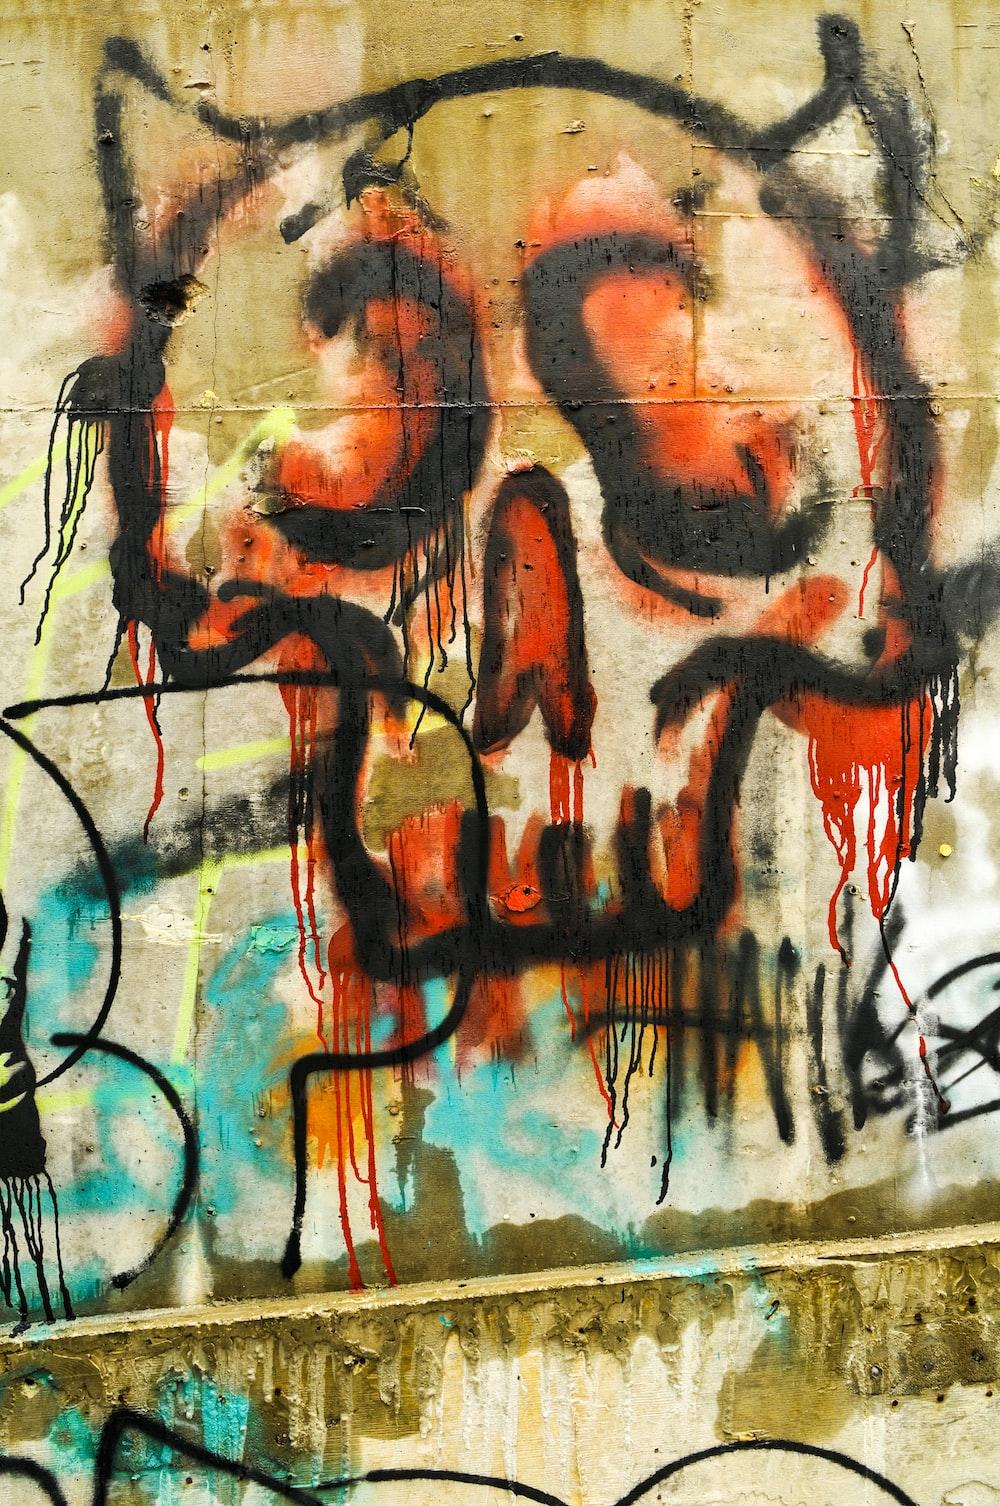 close-up photo of skull mural